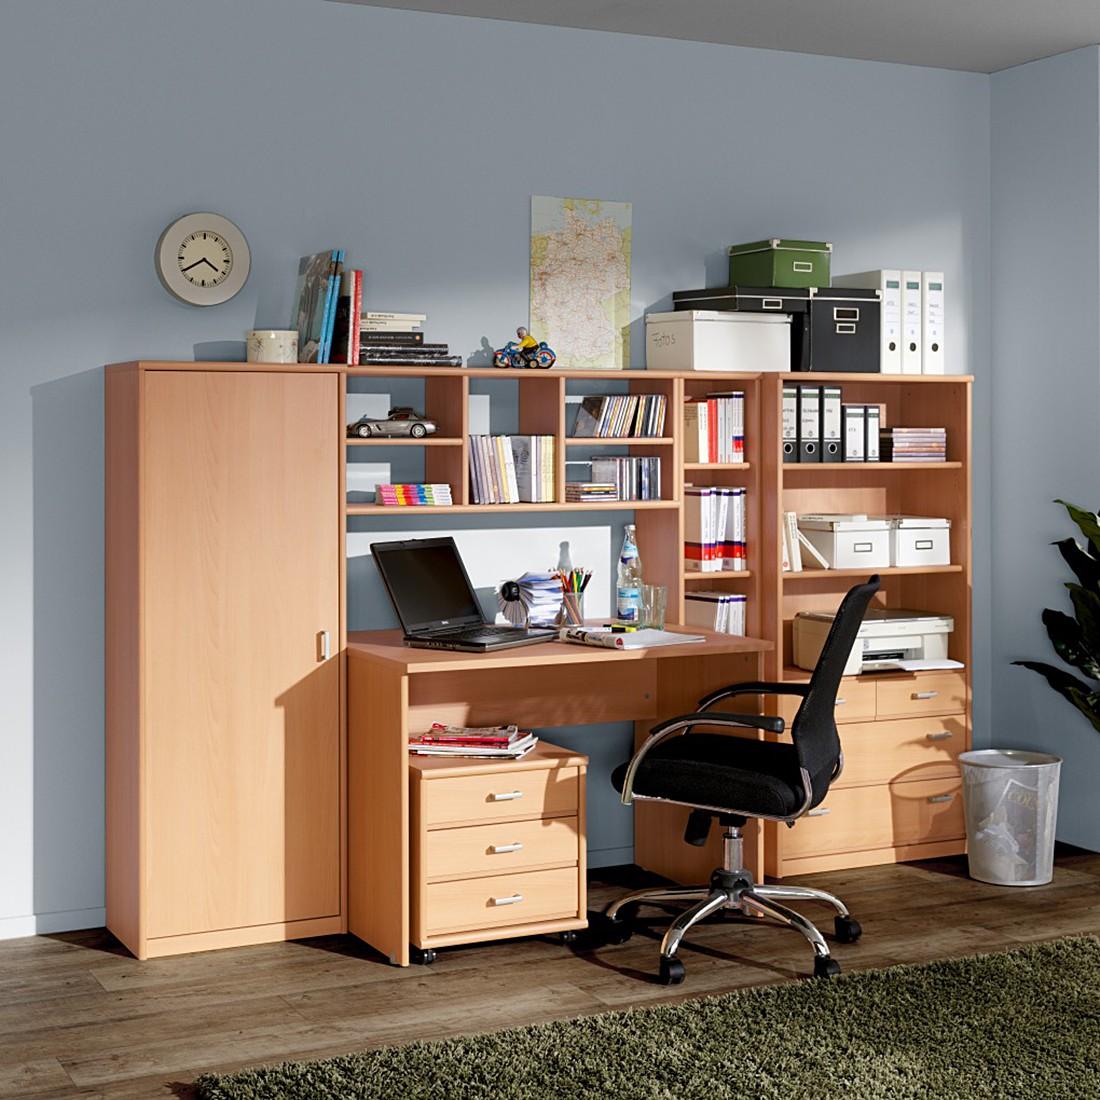 cs schmal wandregal soft plus ii buche dekor h ngeregal b cherregal wandboard ebay. Black Bedroom Furniture Sets. Home Design Ideas